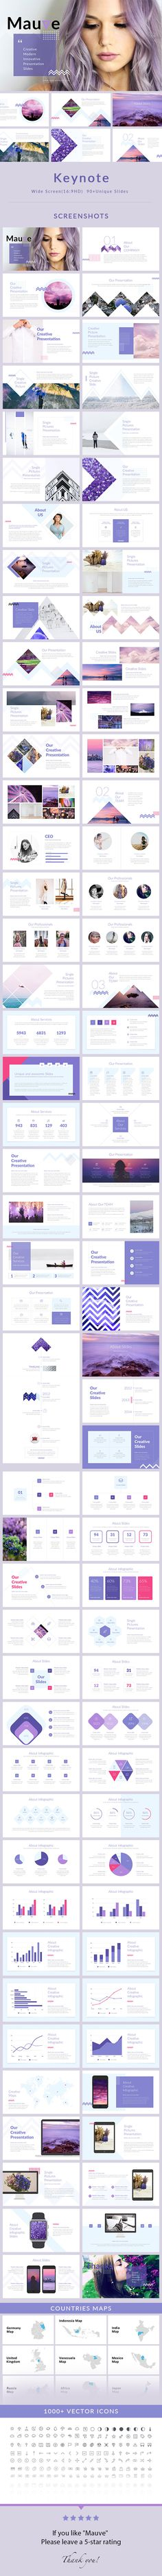 Mauve  Keynote Presentation Template — Keynote KEY #minimal • Download ➝ https://graphicriver.net/item/mauve-keynote-presentation-template/19934842?ref=pxcr